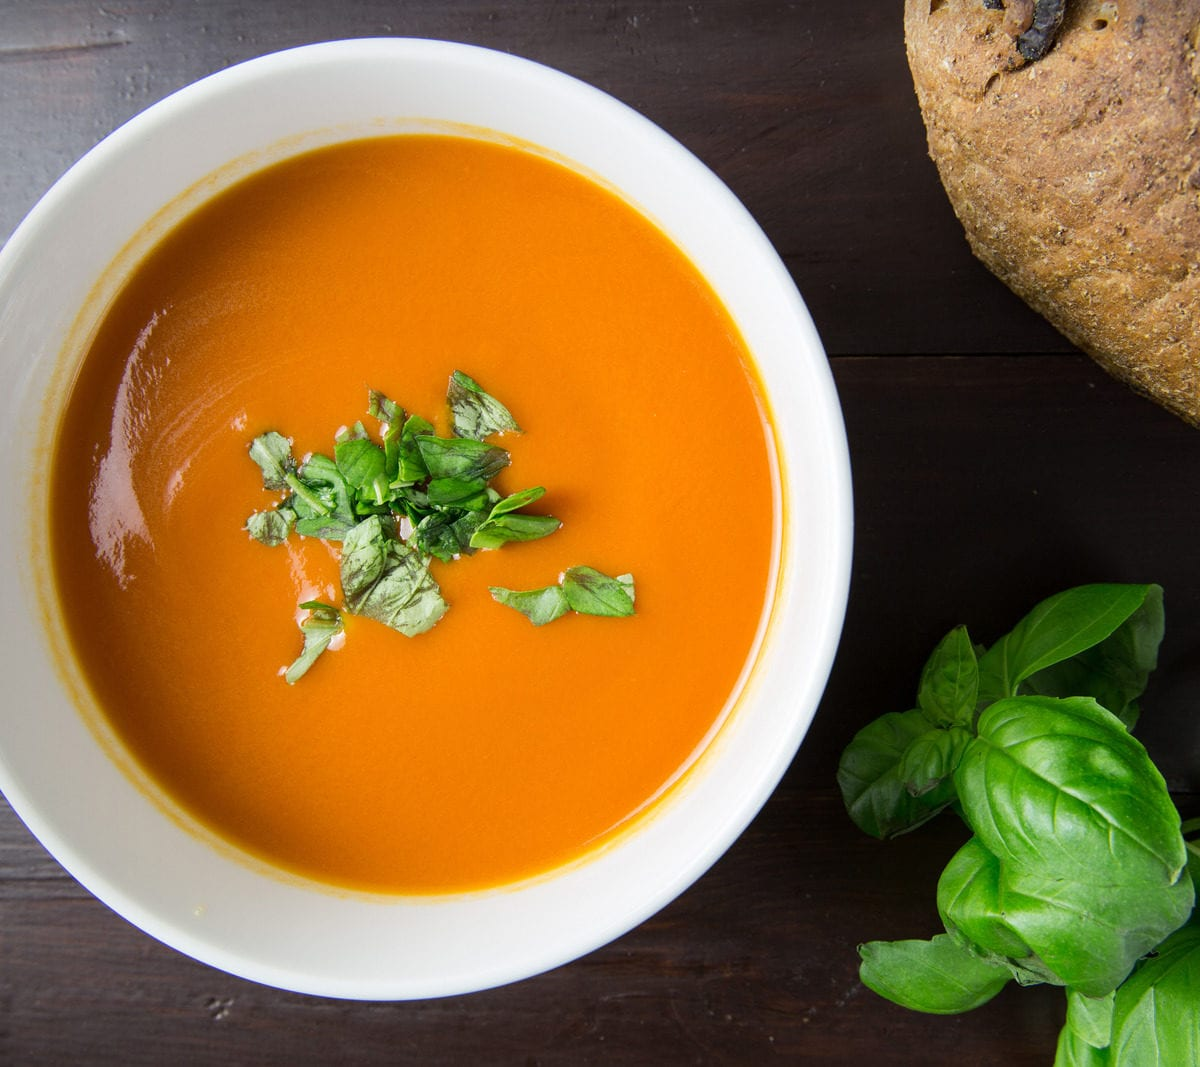 Canva - Brown Soup in White Ceramic Bowl